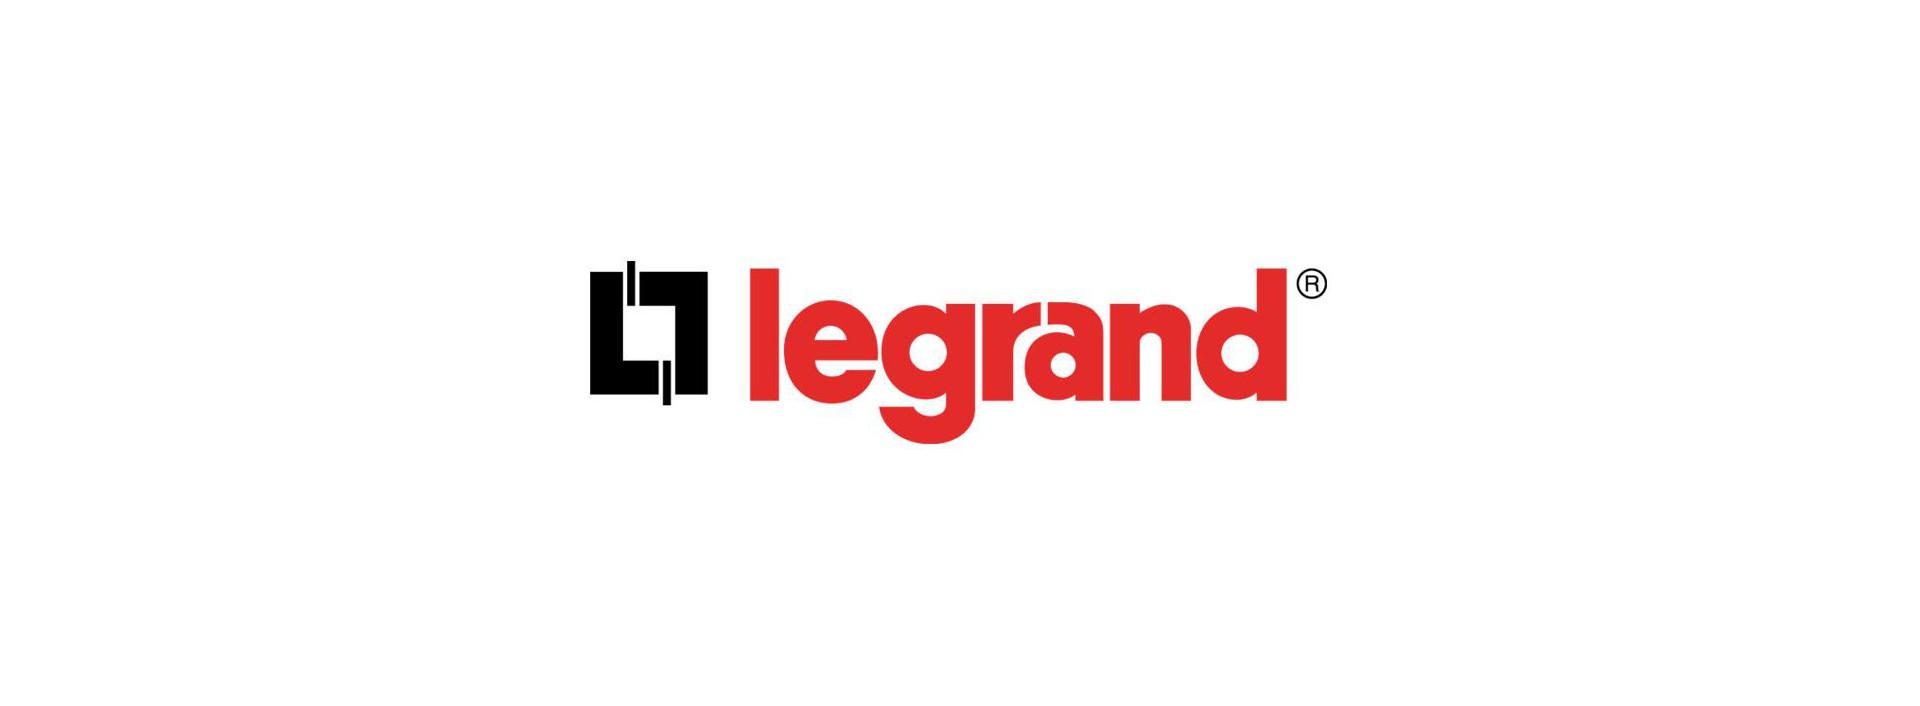 Tableau pré-câblé LEGRAND